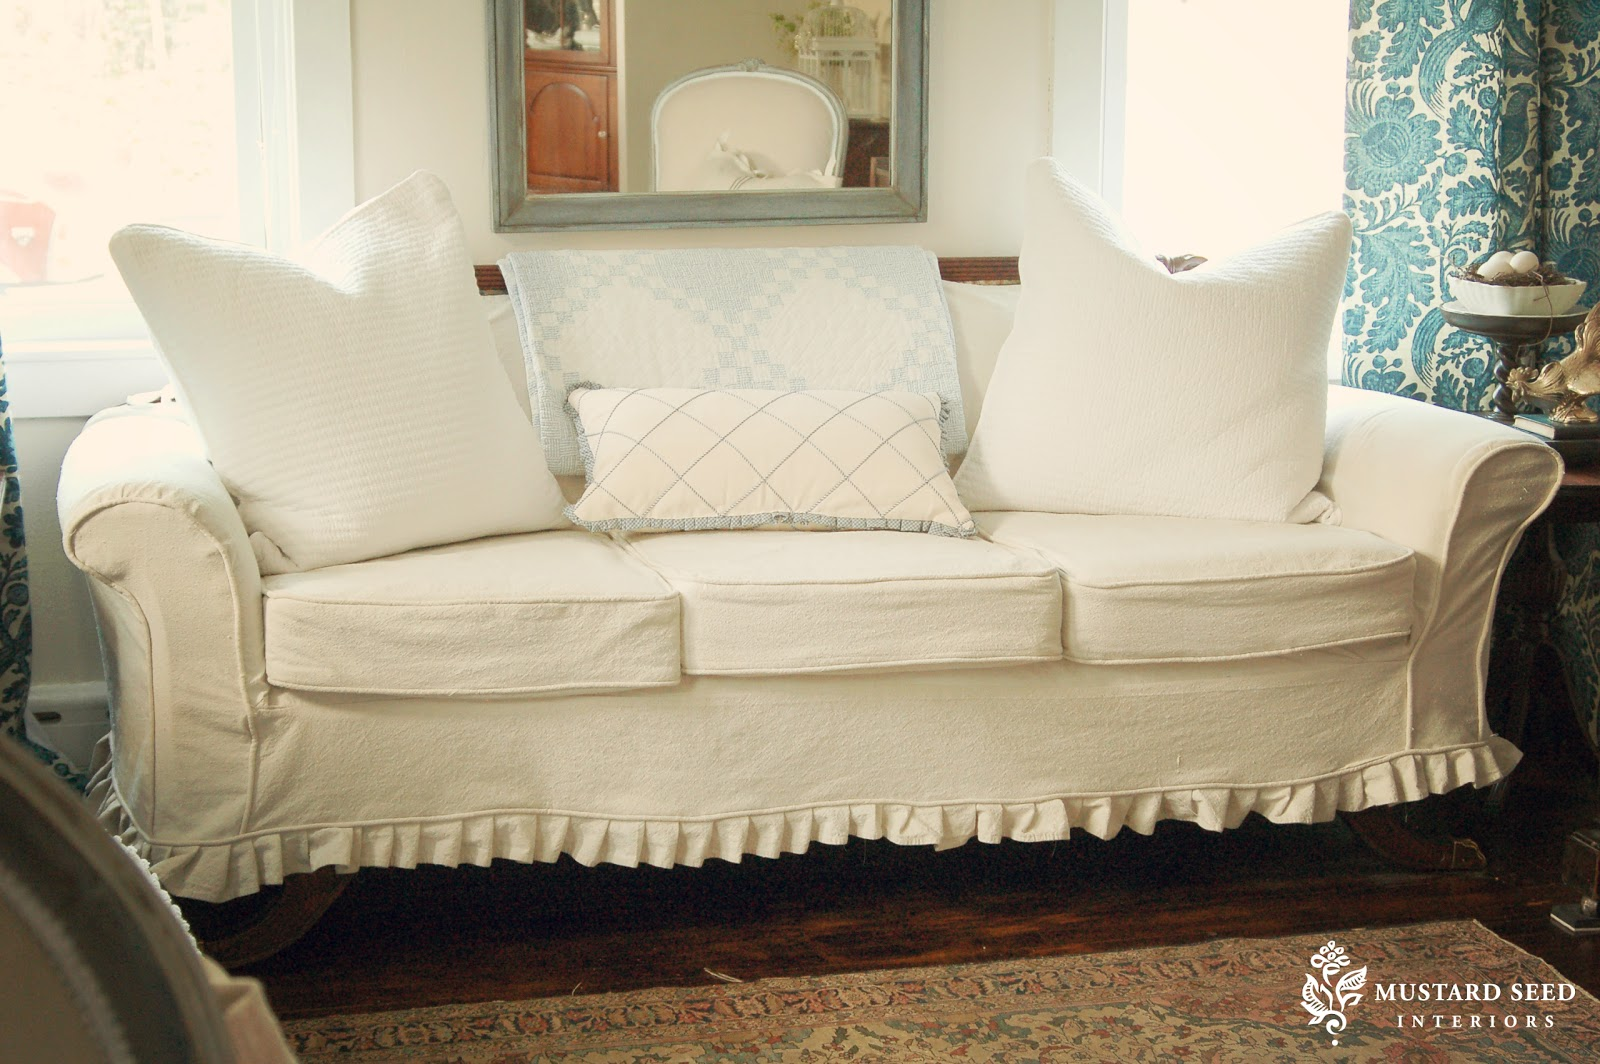 sofa transformation - miss mustard seed